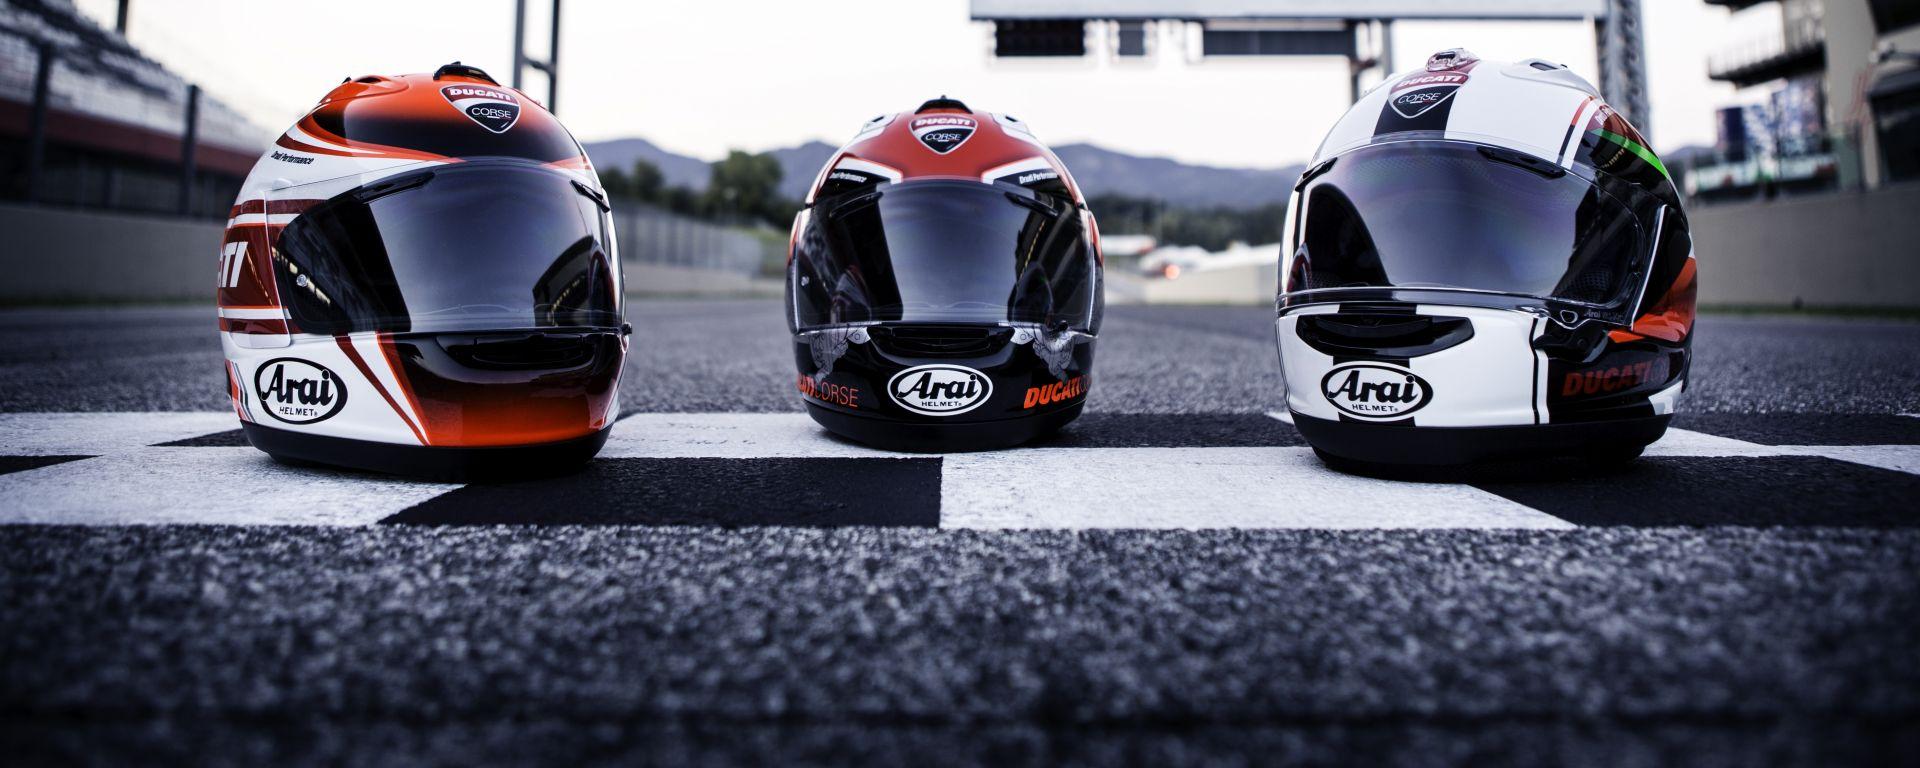 Campagna sostituzione casco Ducati